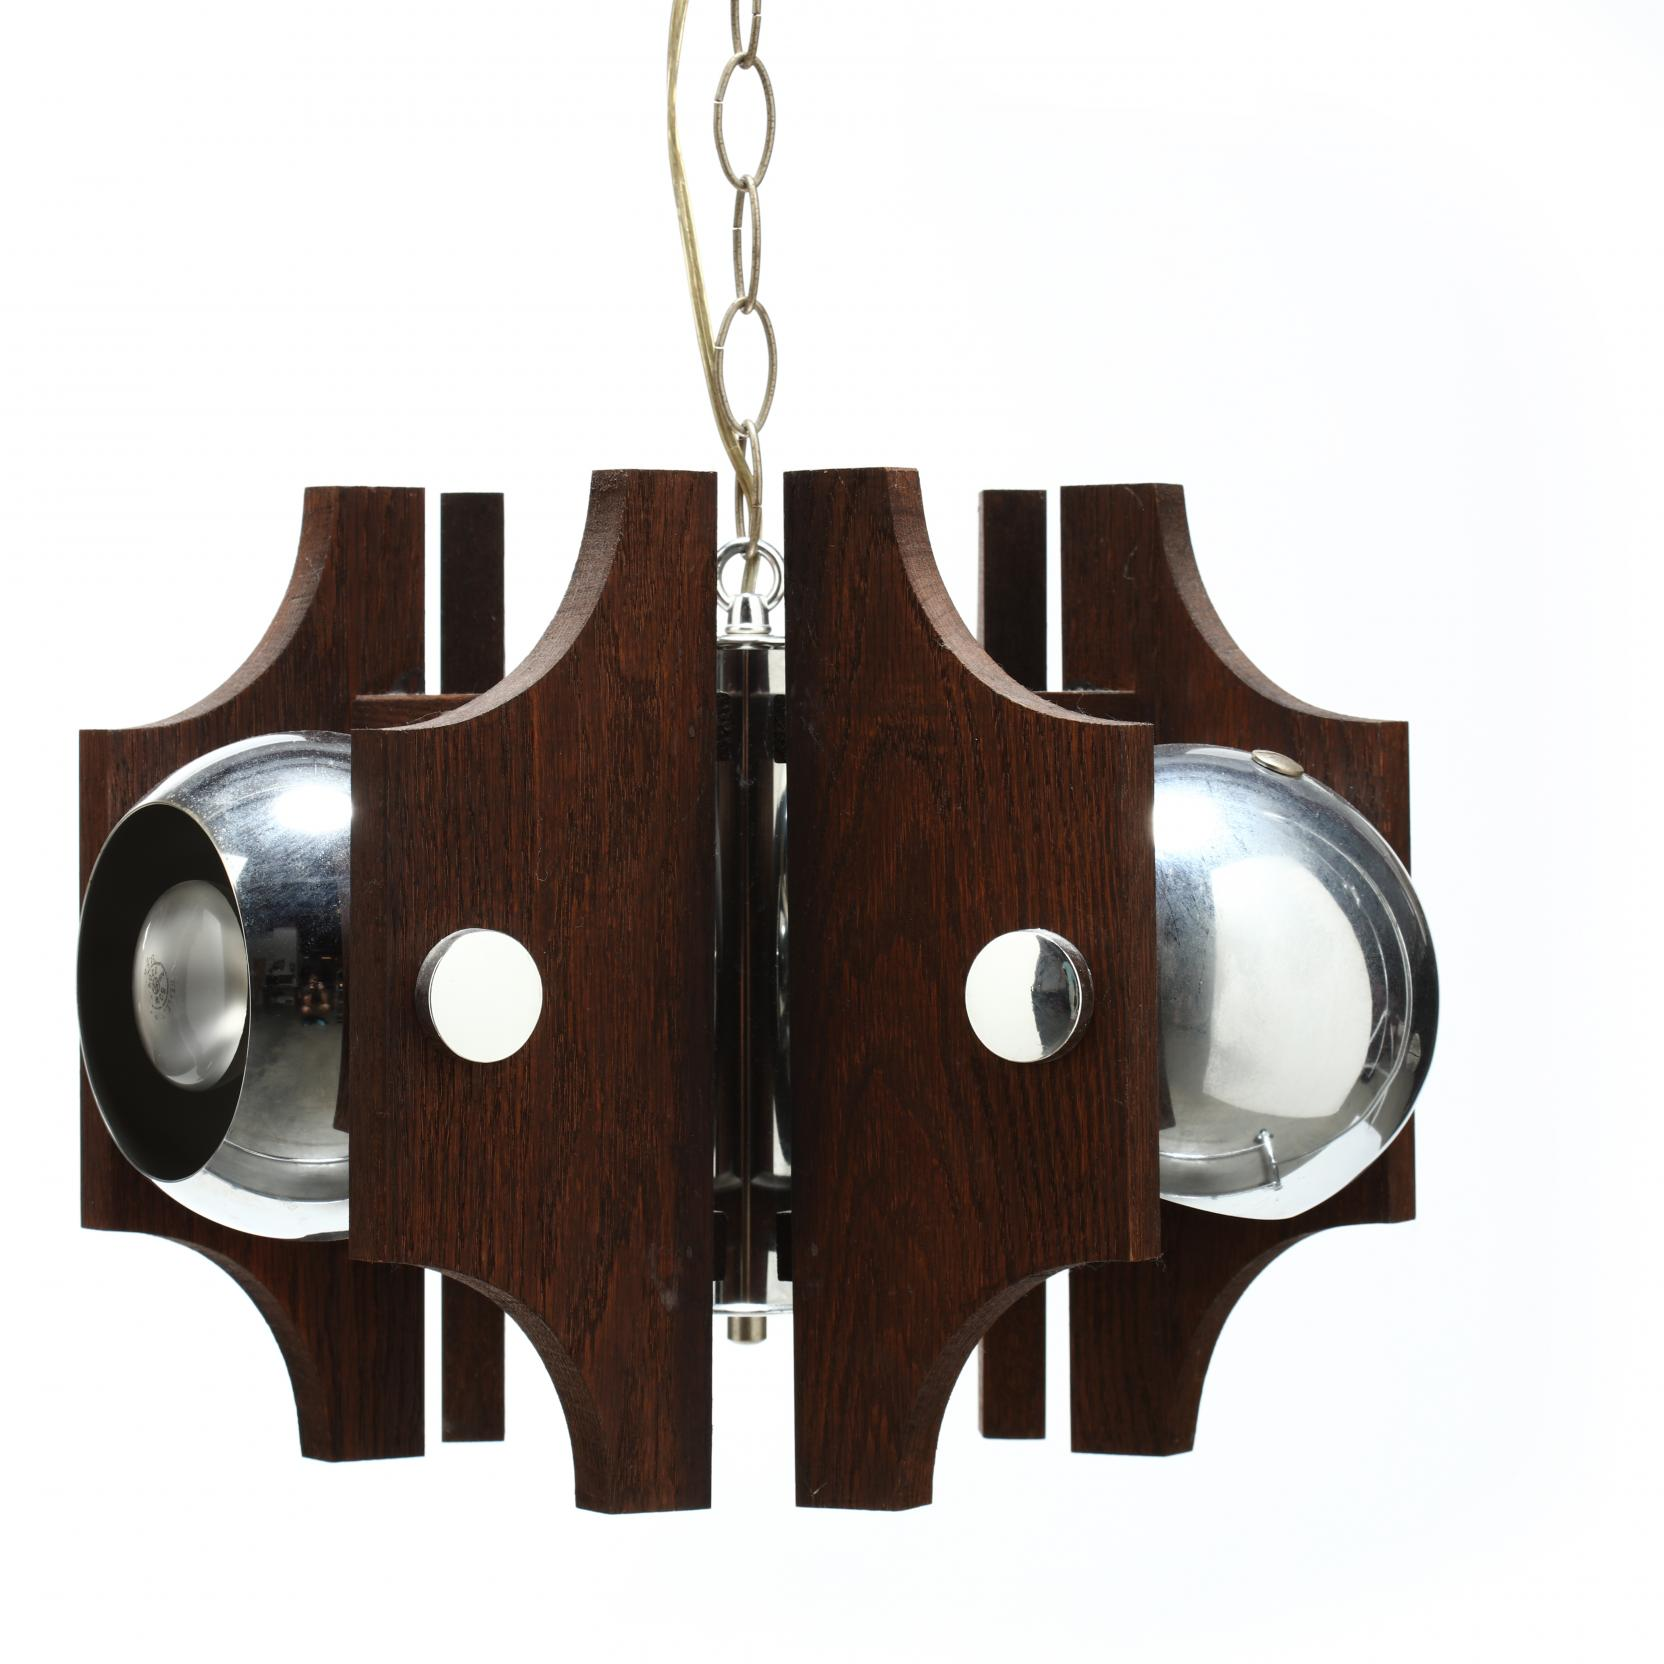 modernist-chandelier